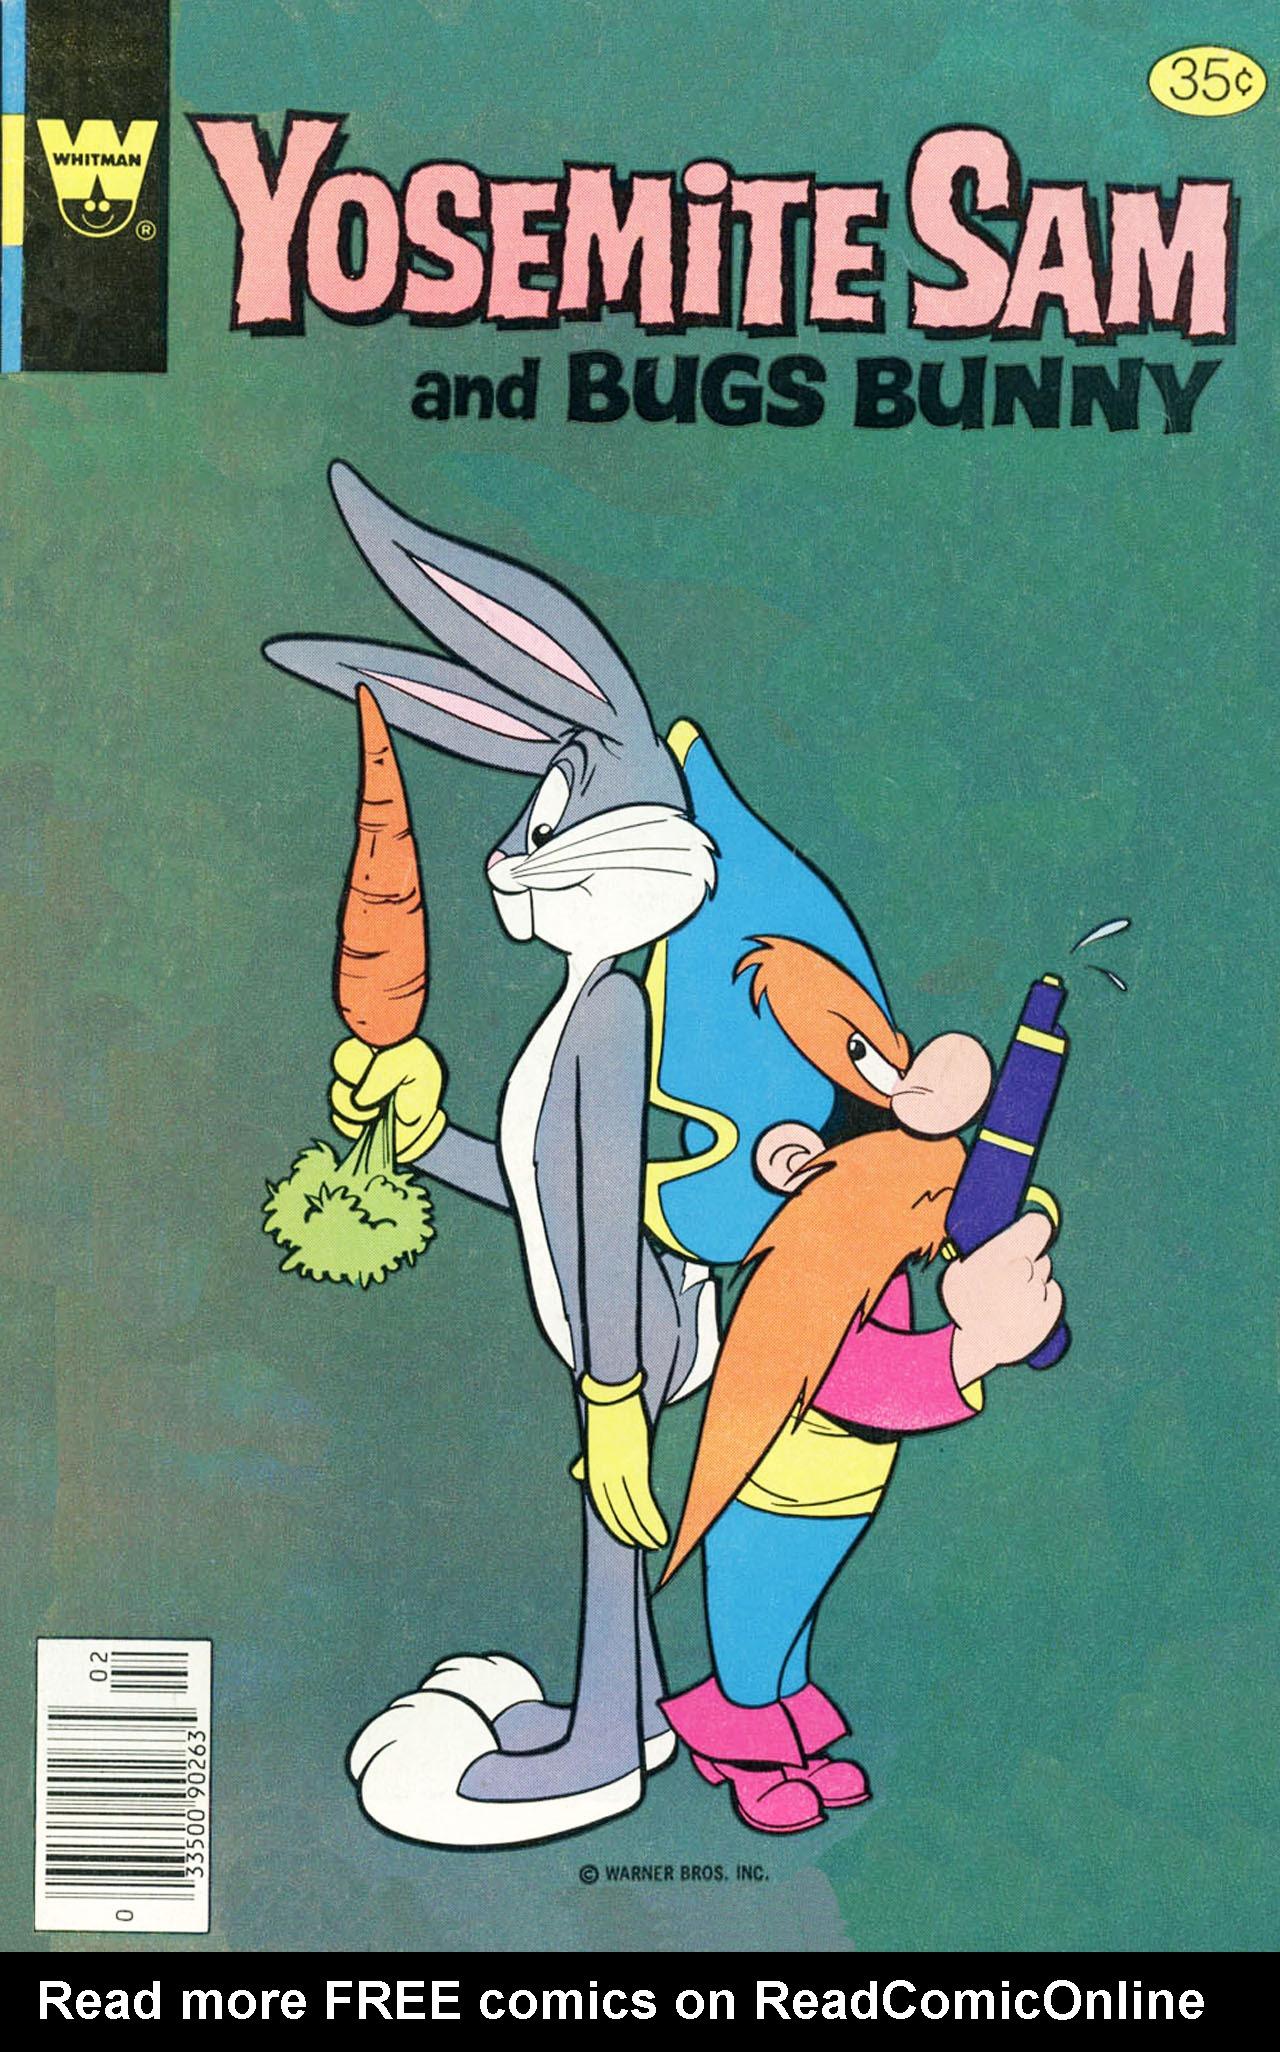 Yosemite Sam and Bugs Bunny 58 Page 1